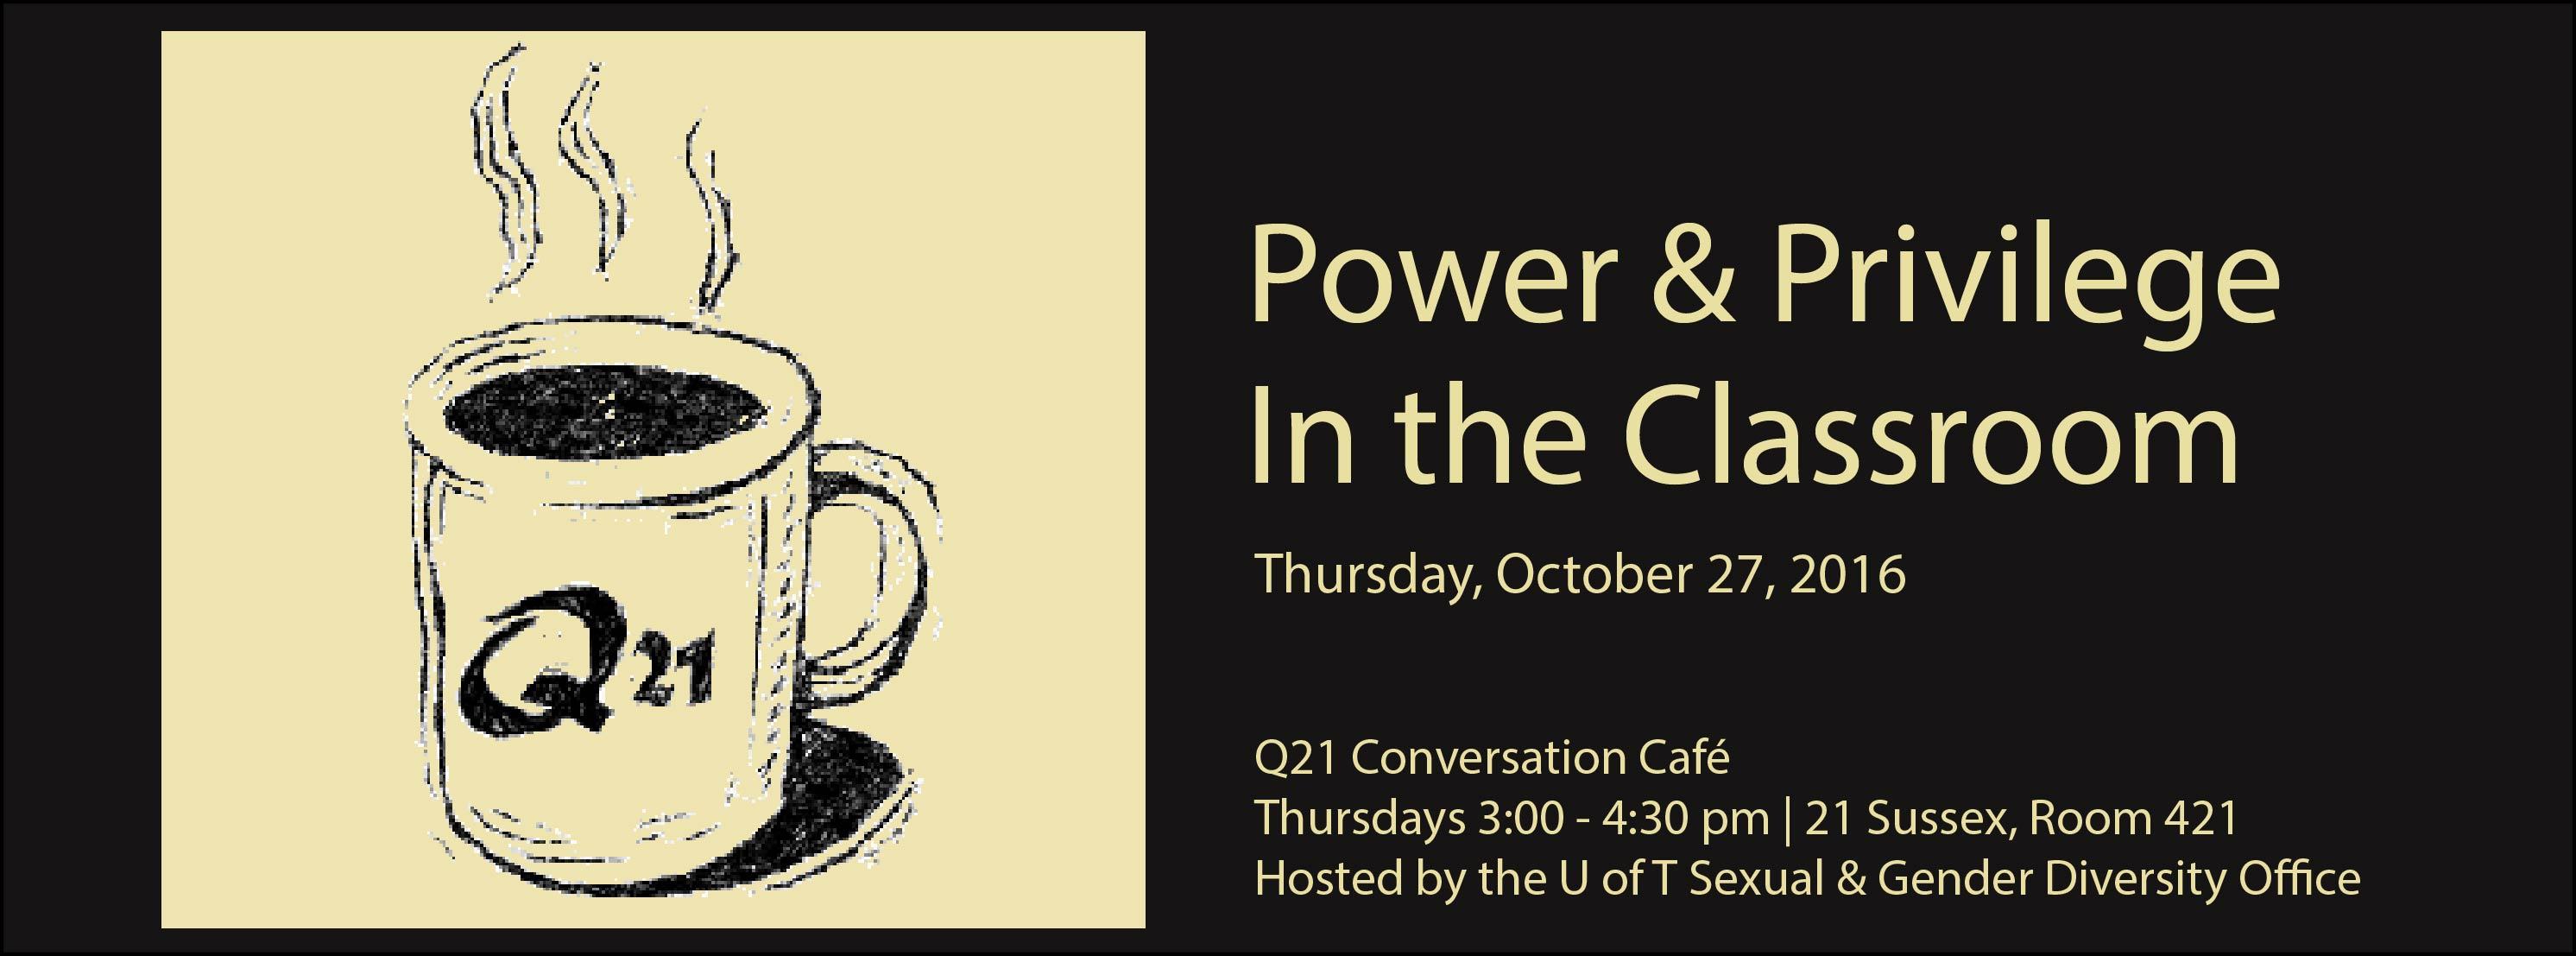 q21-power-privilege-in-the-classroom